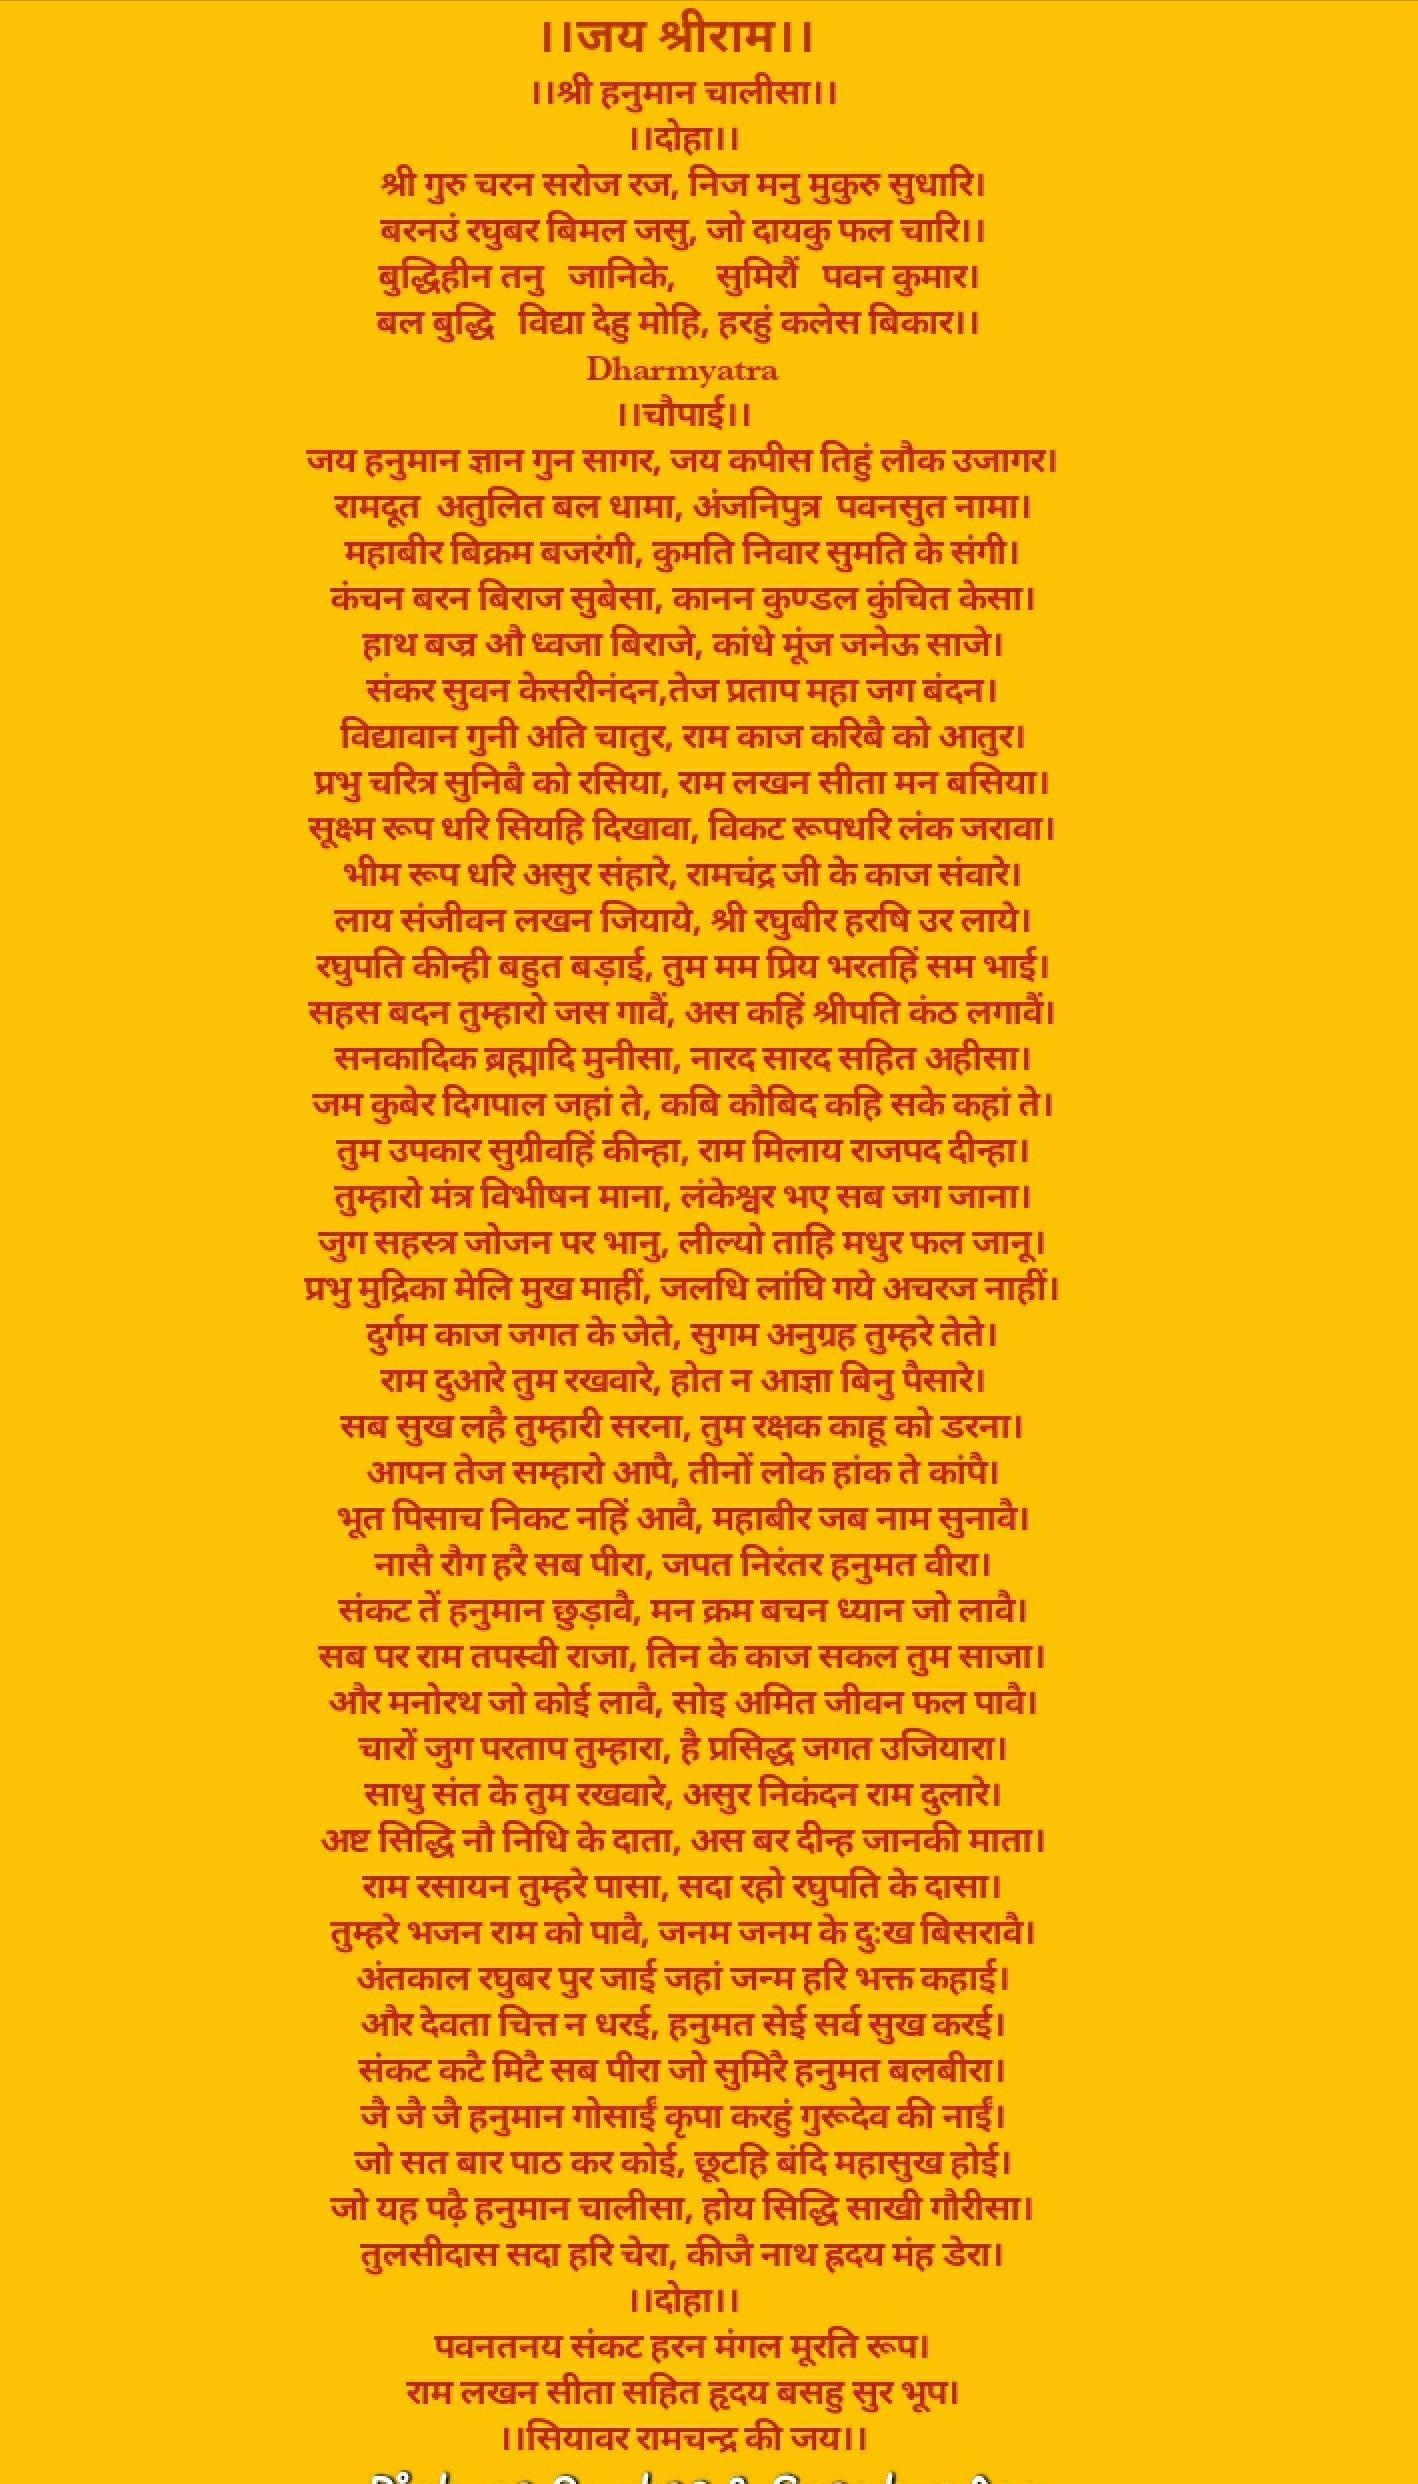 Hanuman Chalisa In Red Fonts On A Yellow Background Hanuman Ji